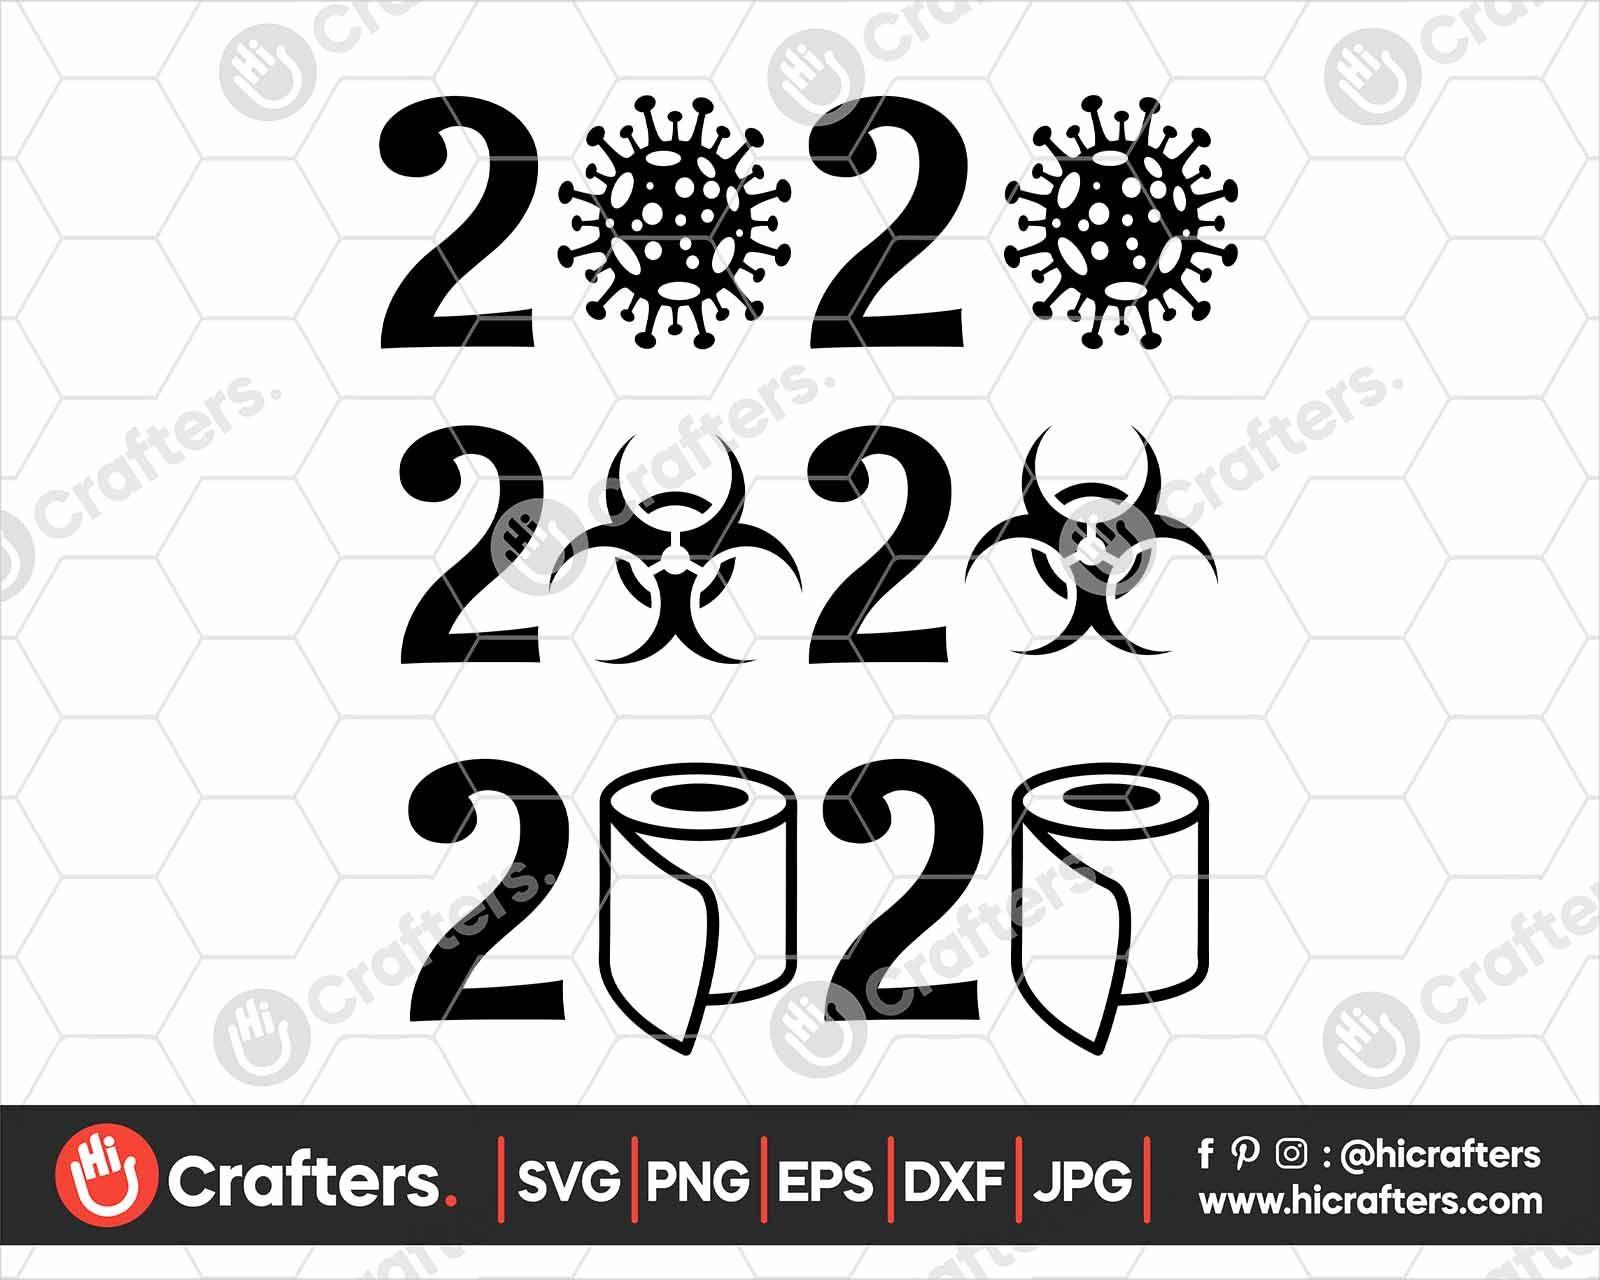 Pin on 2020 Quarantine SVG PNG Files